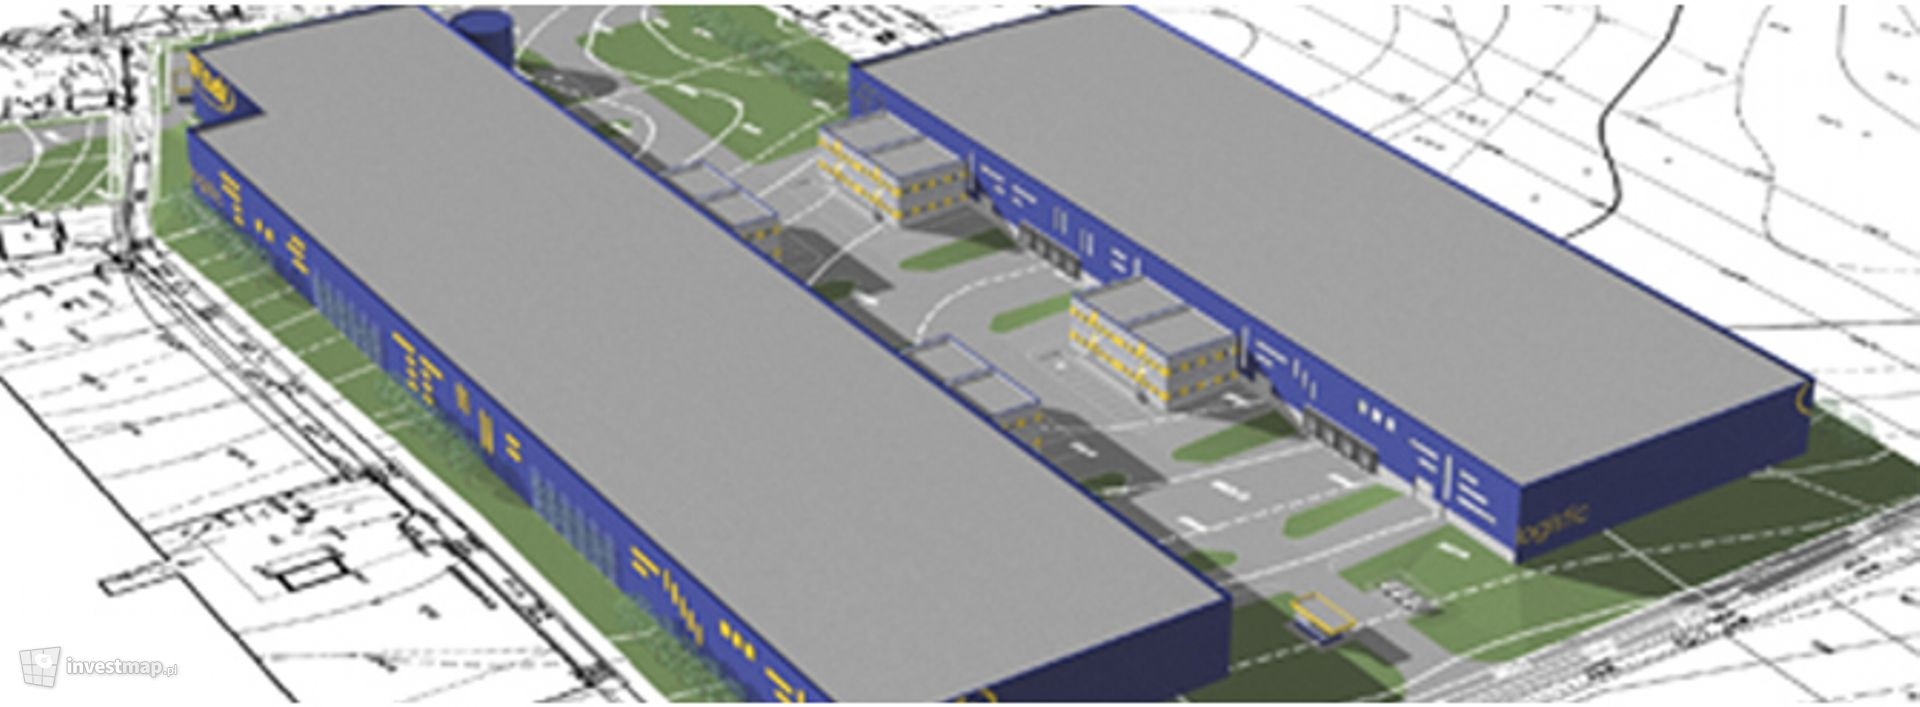 Centrum logistyczne Witek Airport Logistic Centre